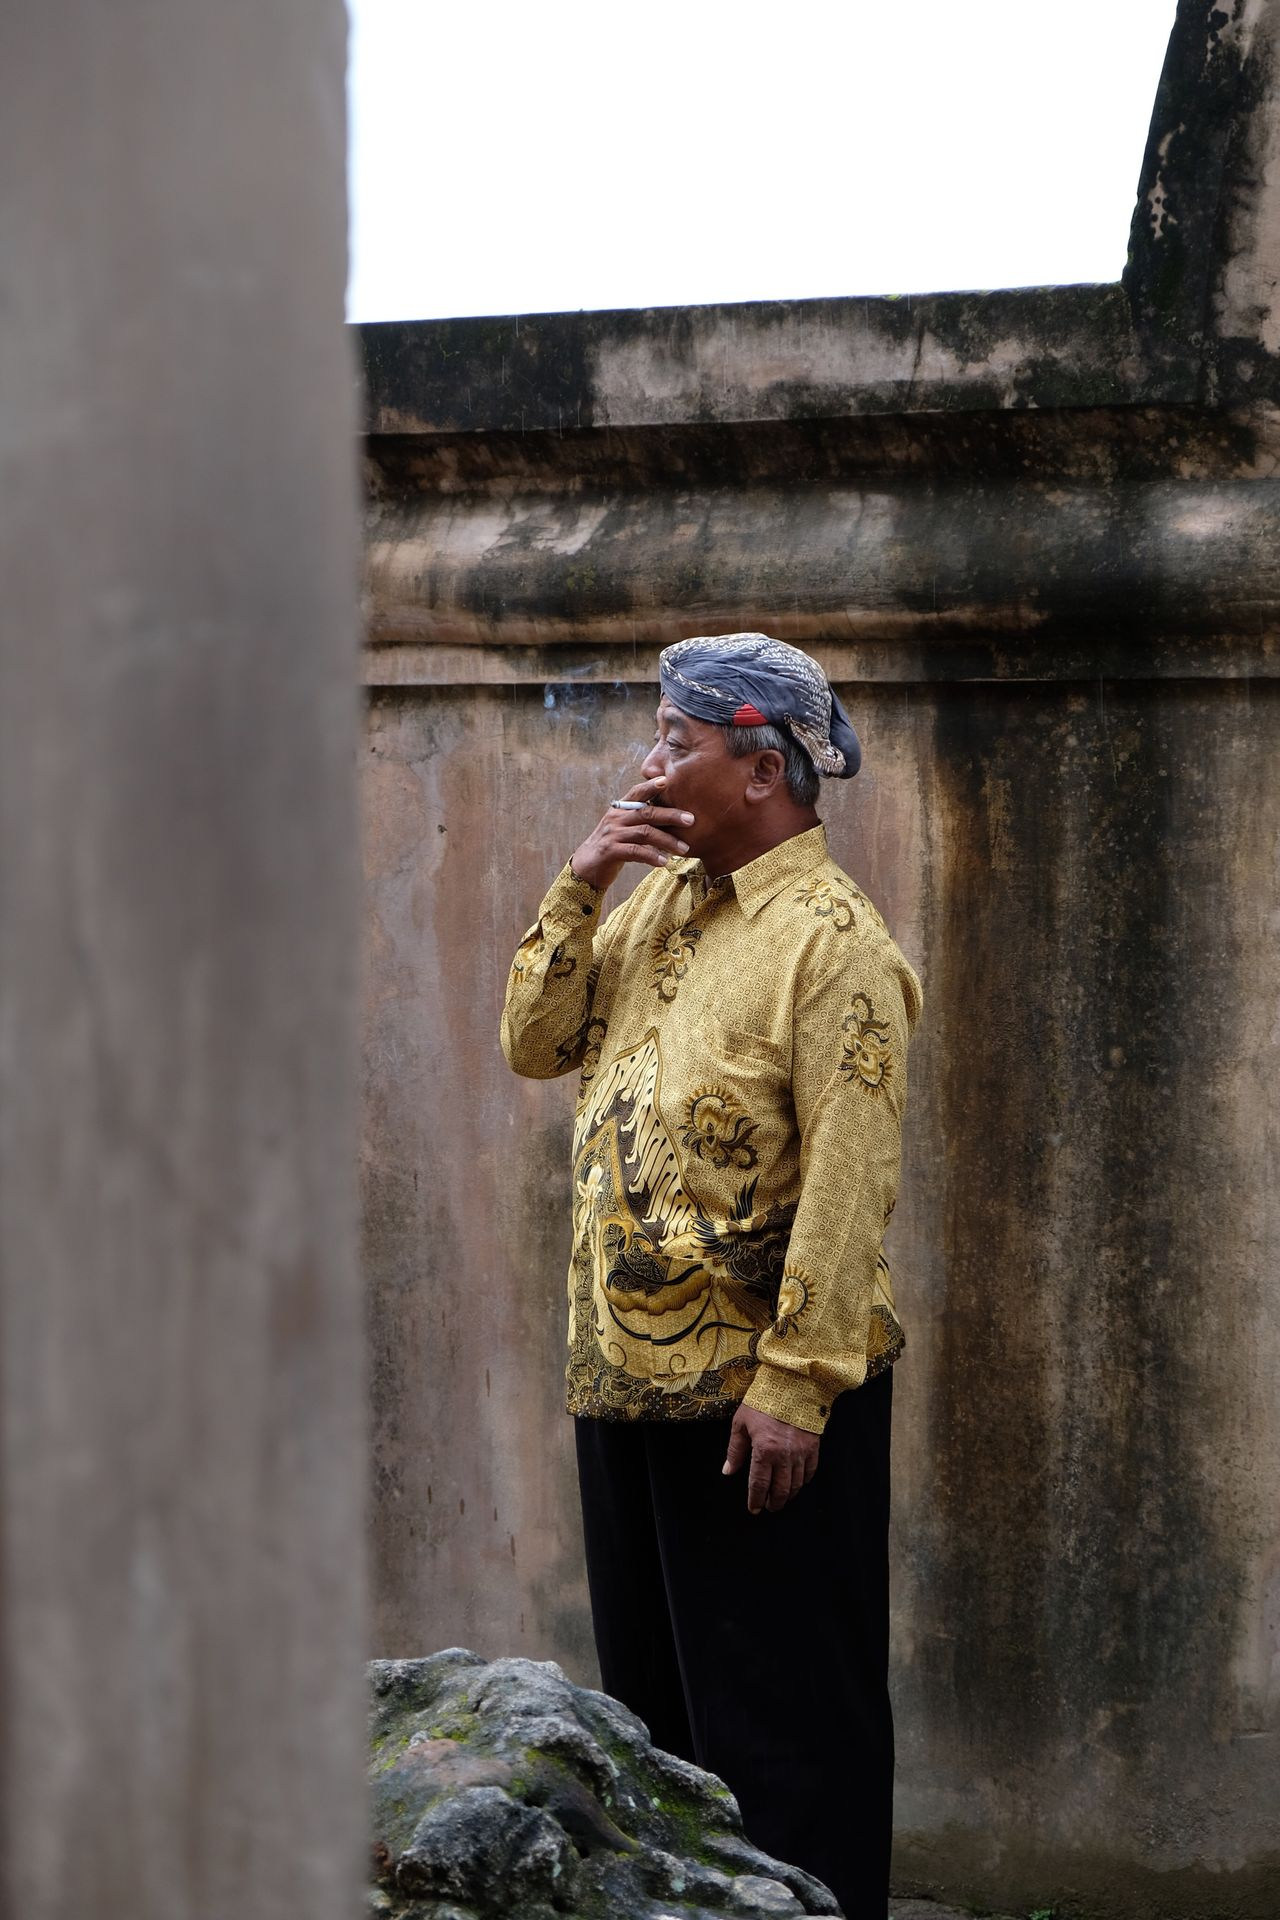 javanese man Real People Day Outdoors Man Javanese Smoking